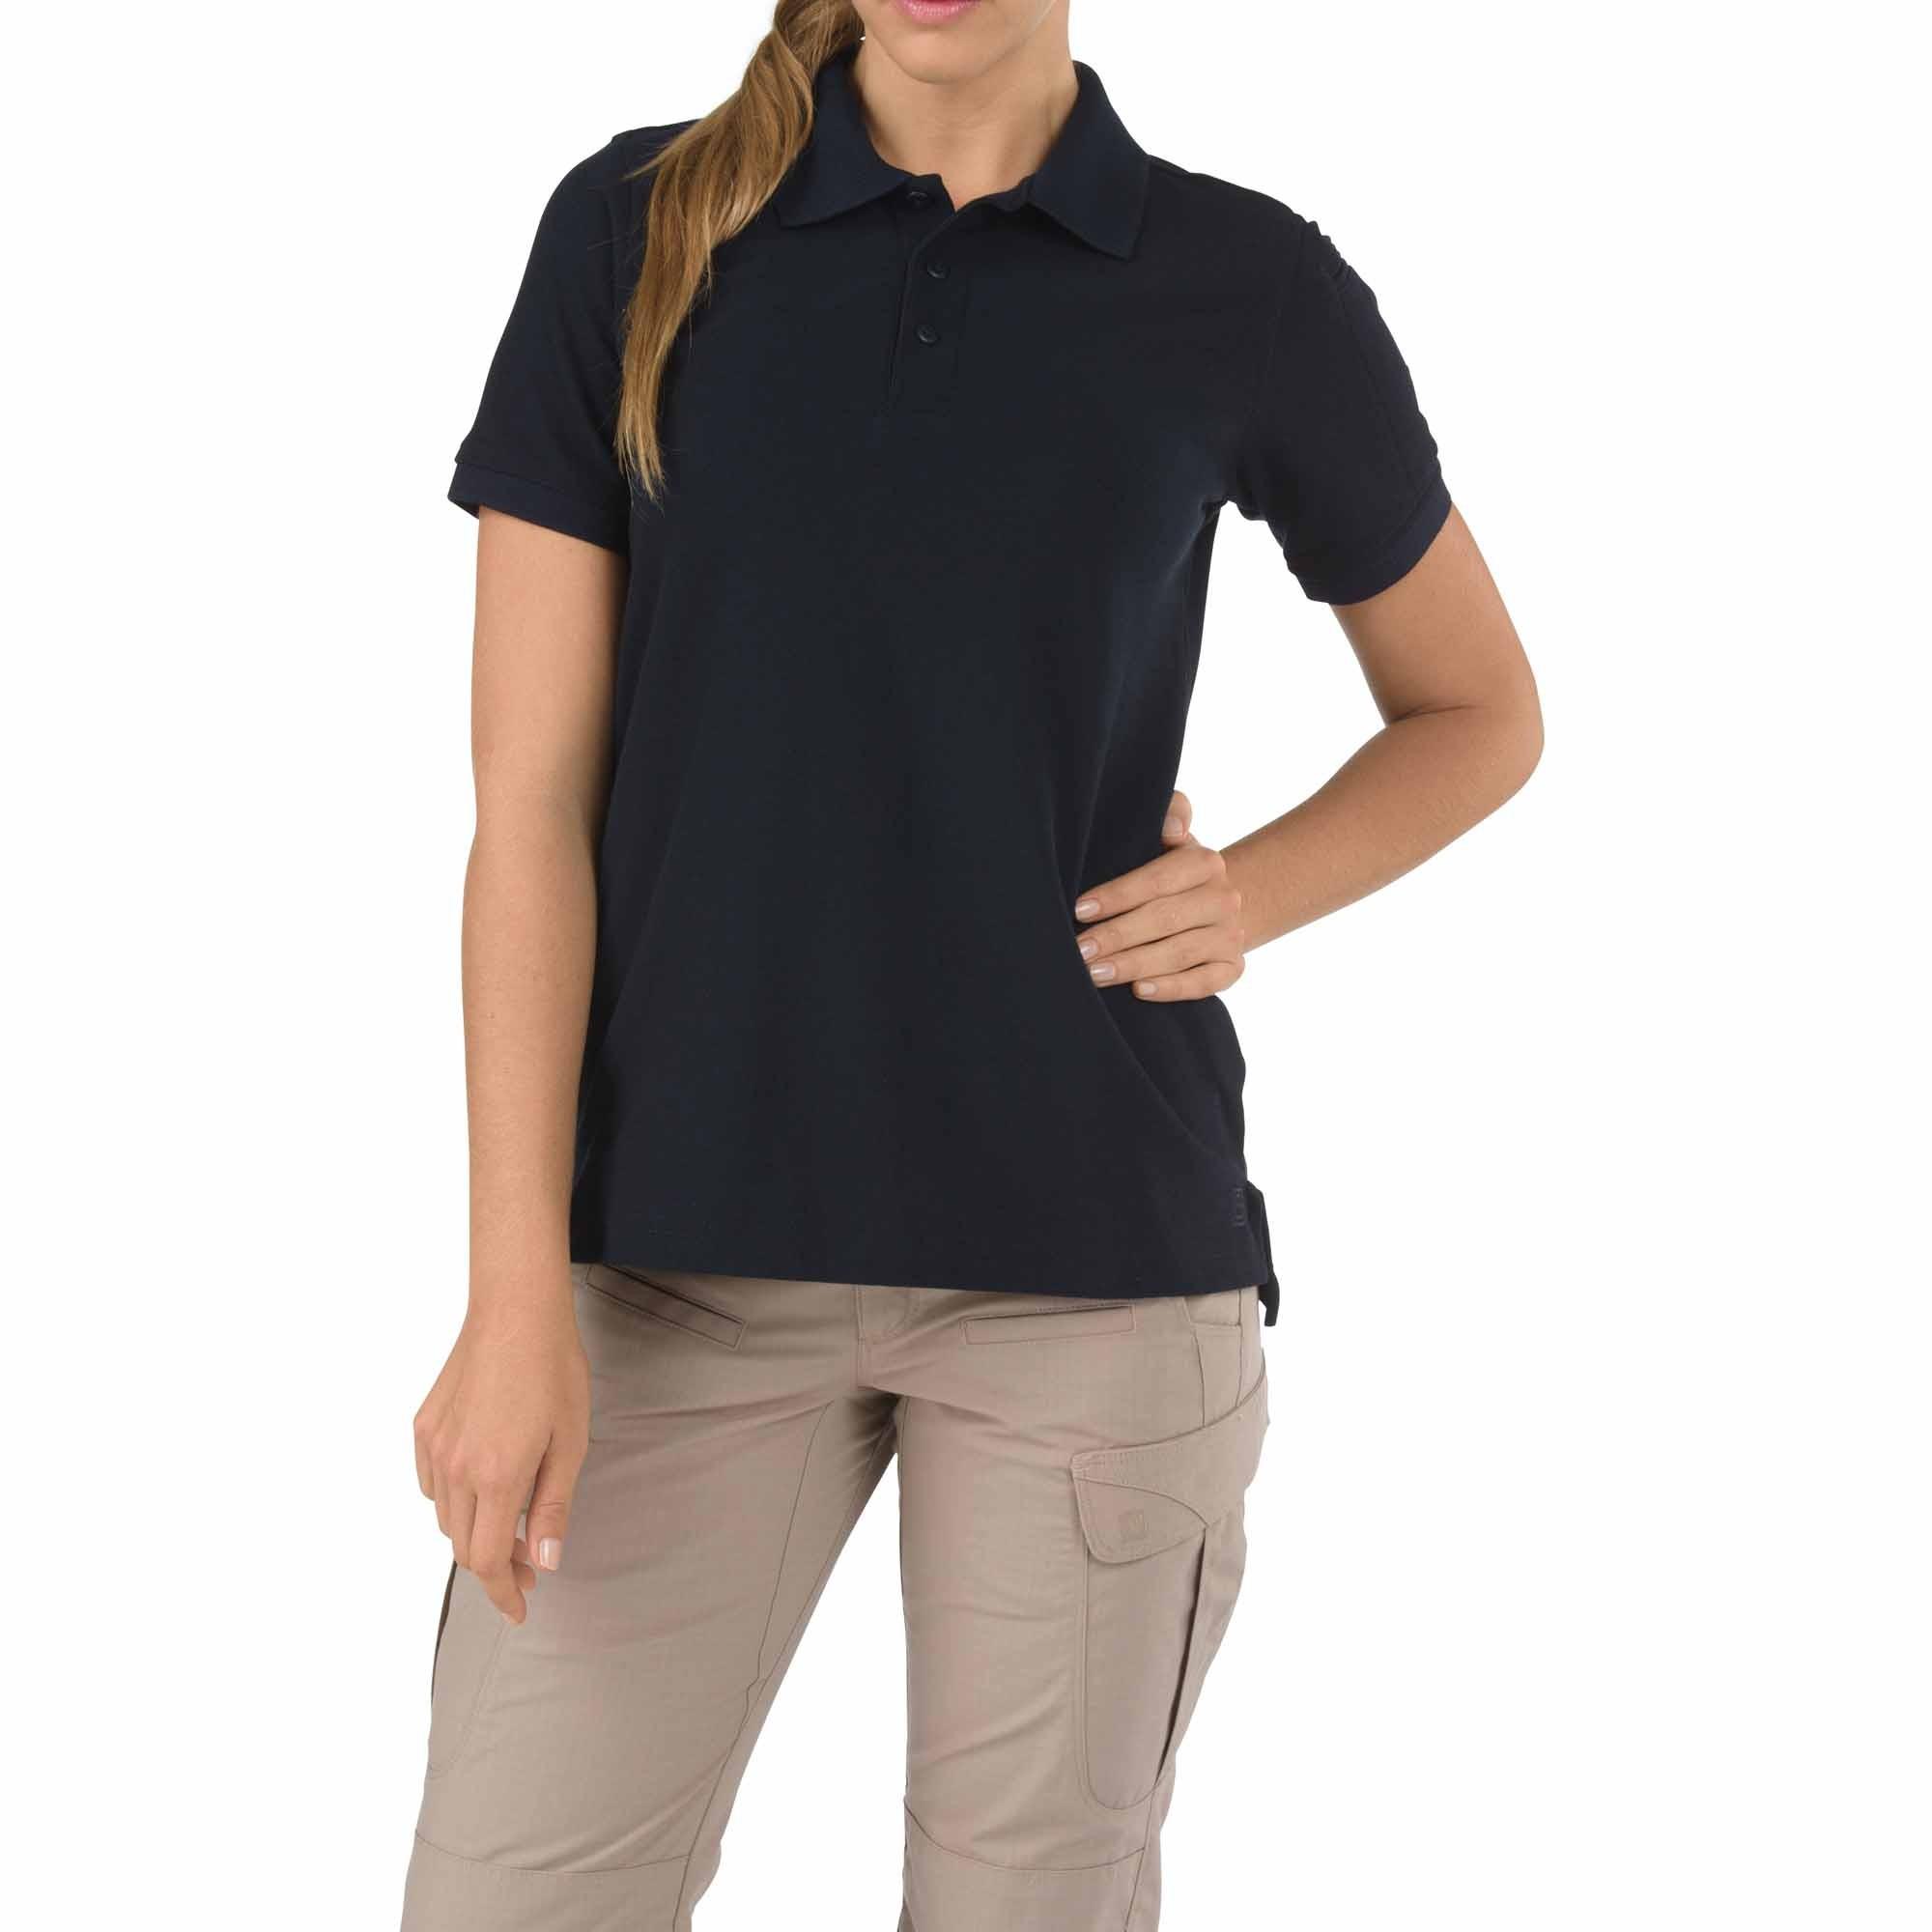 Tactical women 39 s short sleeve tactical jersey polo for Short sleeve shirt for women